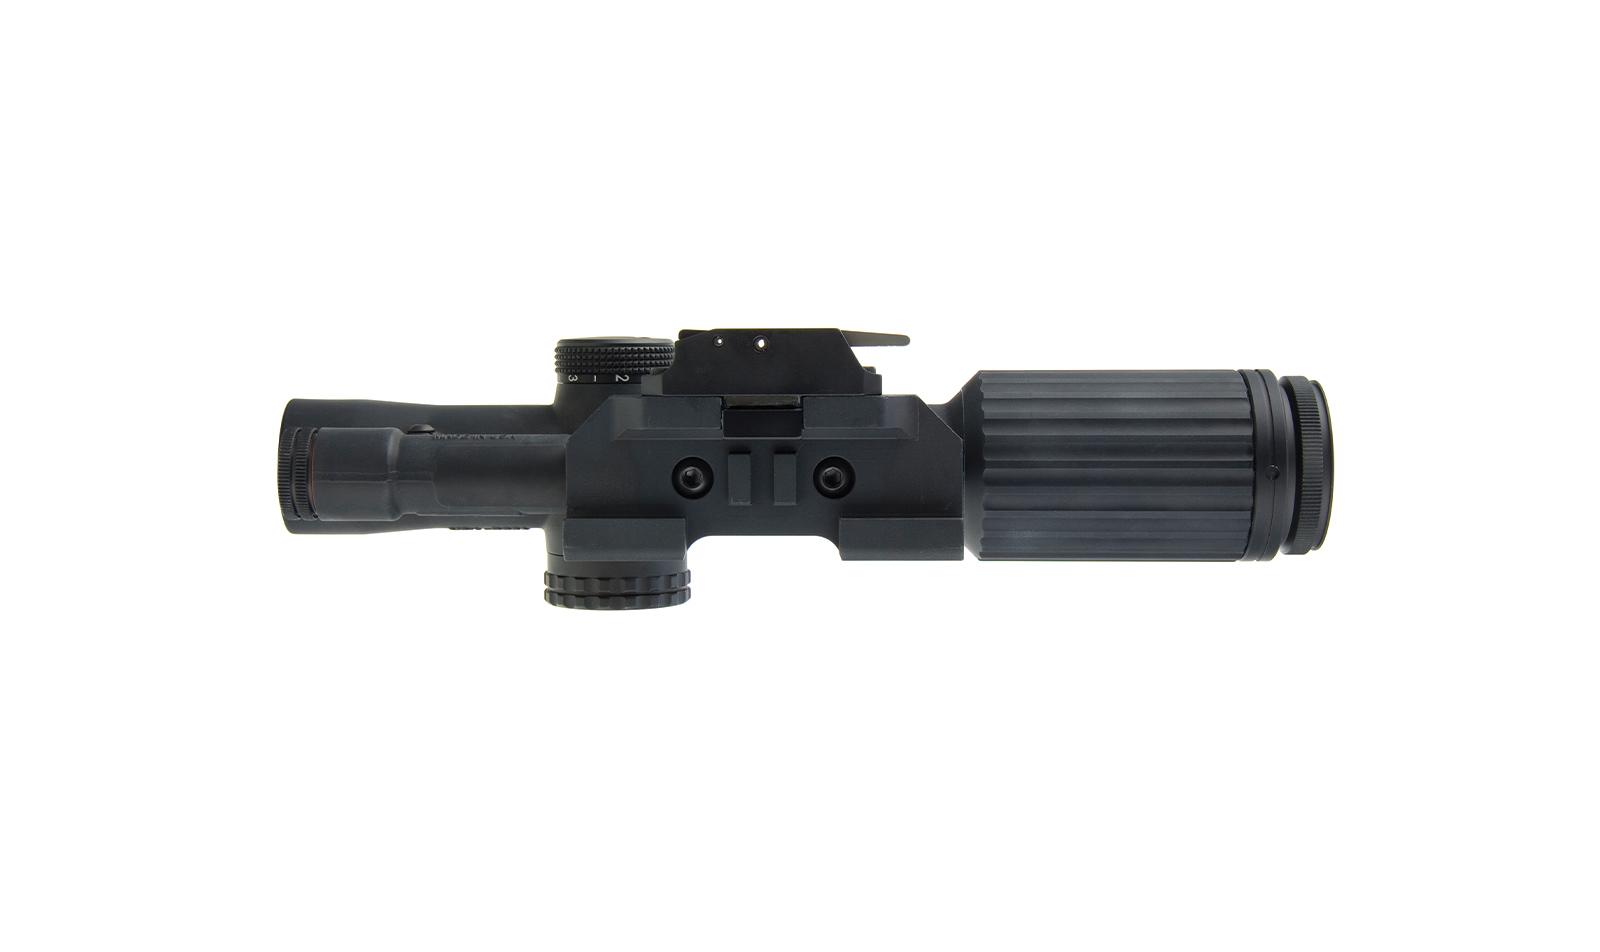 VC16-C-1600053 angle 10